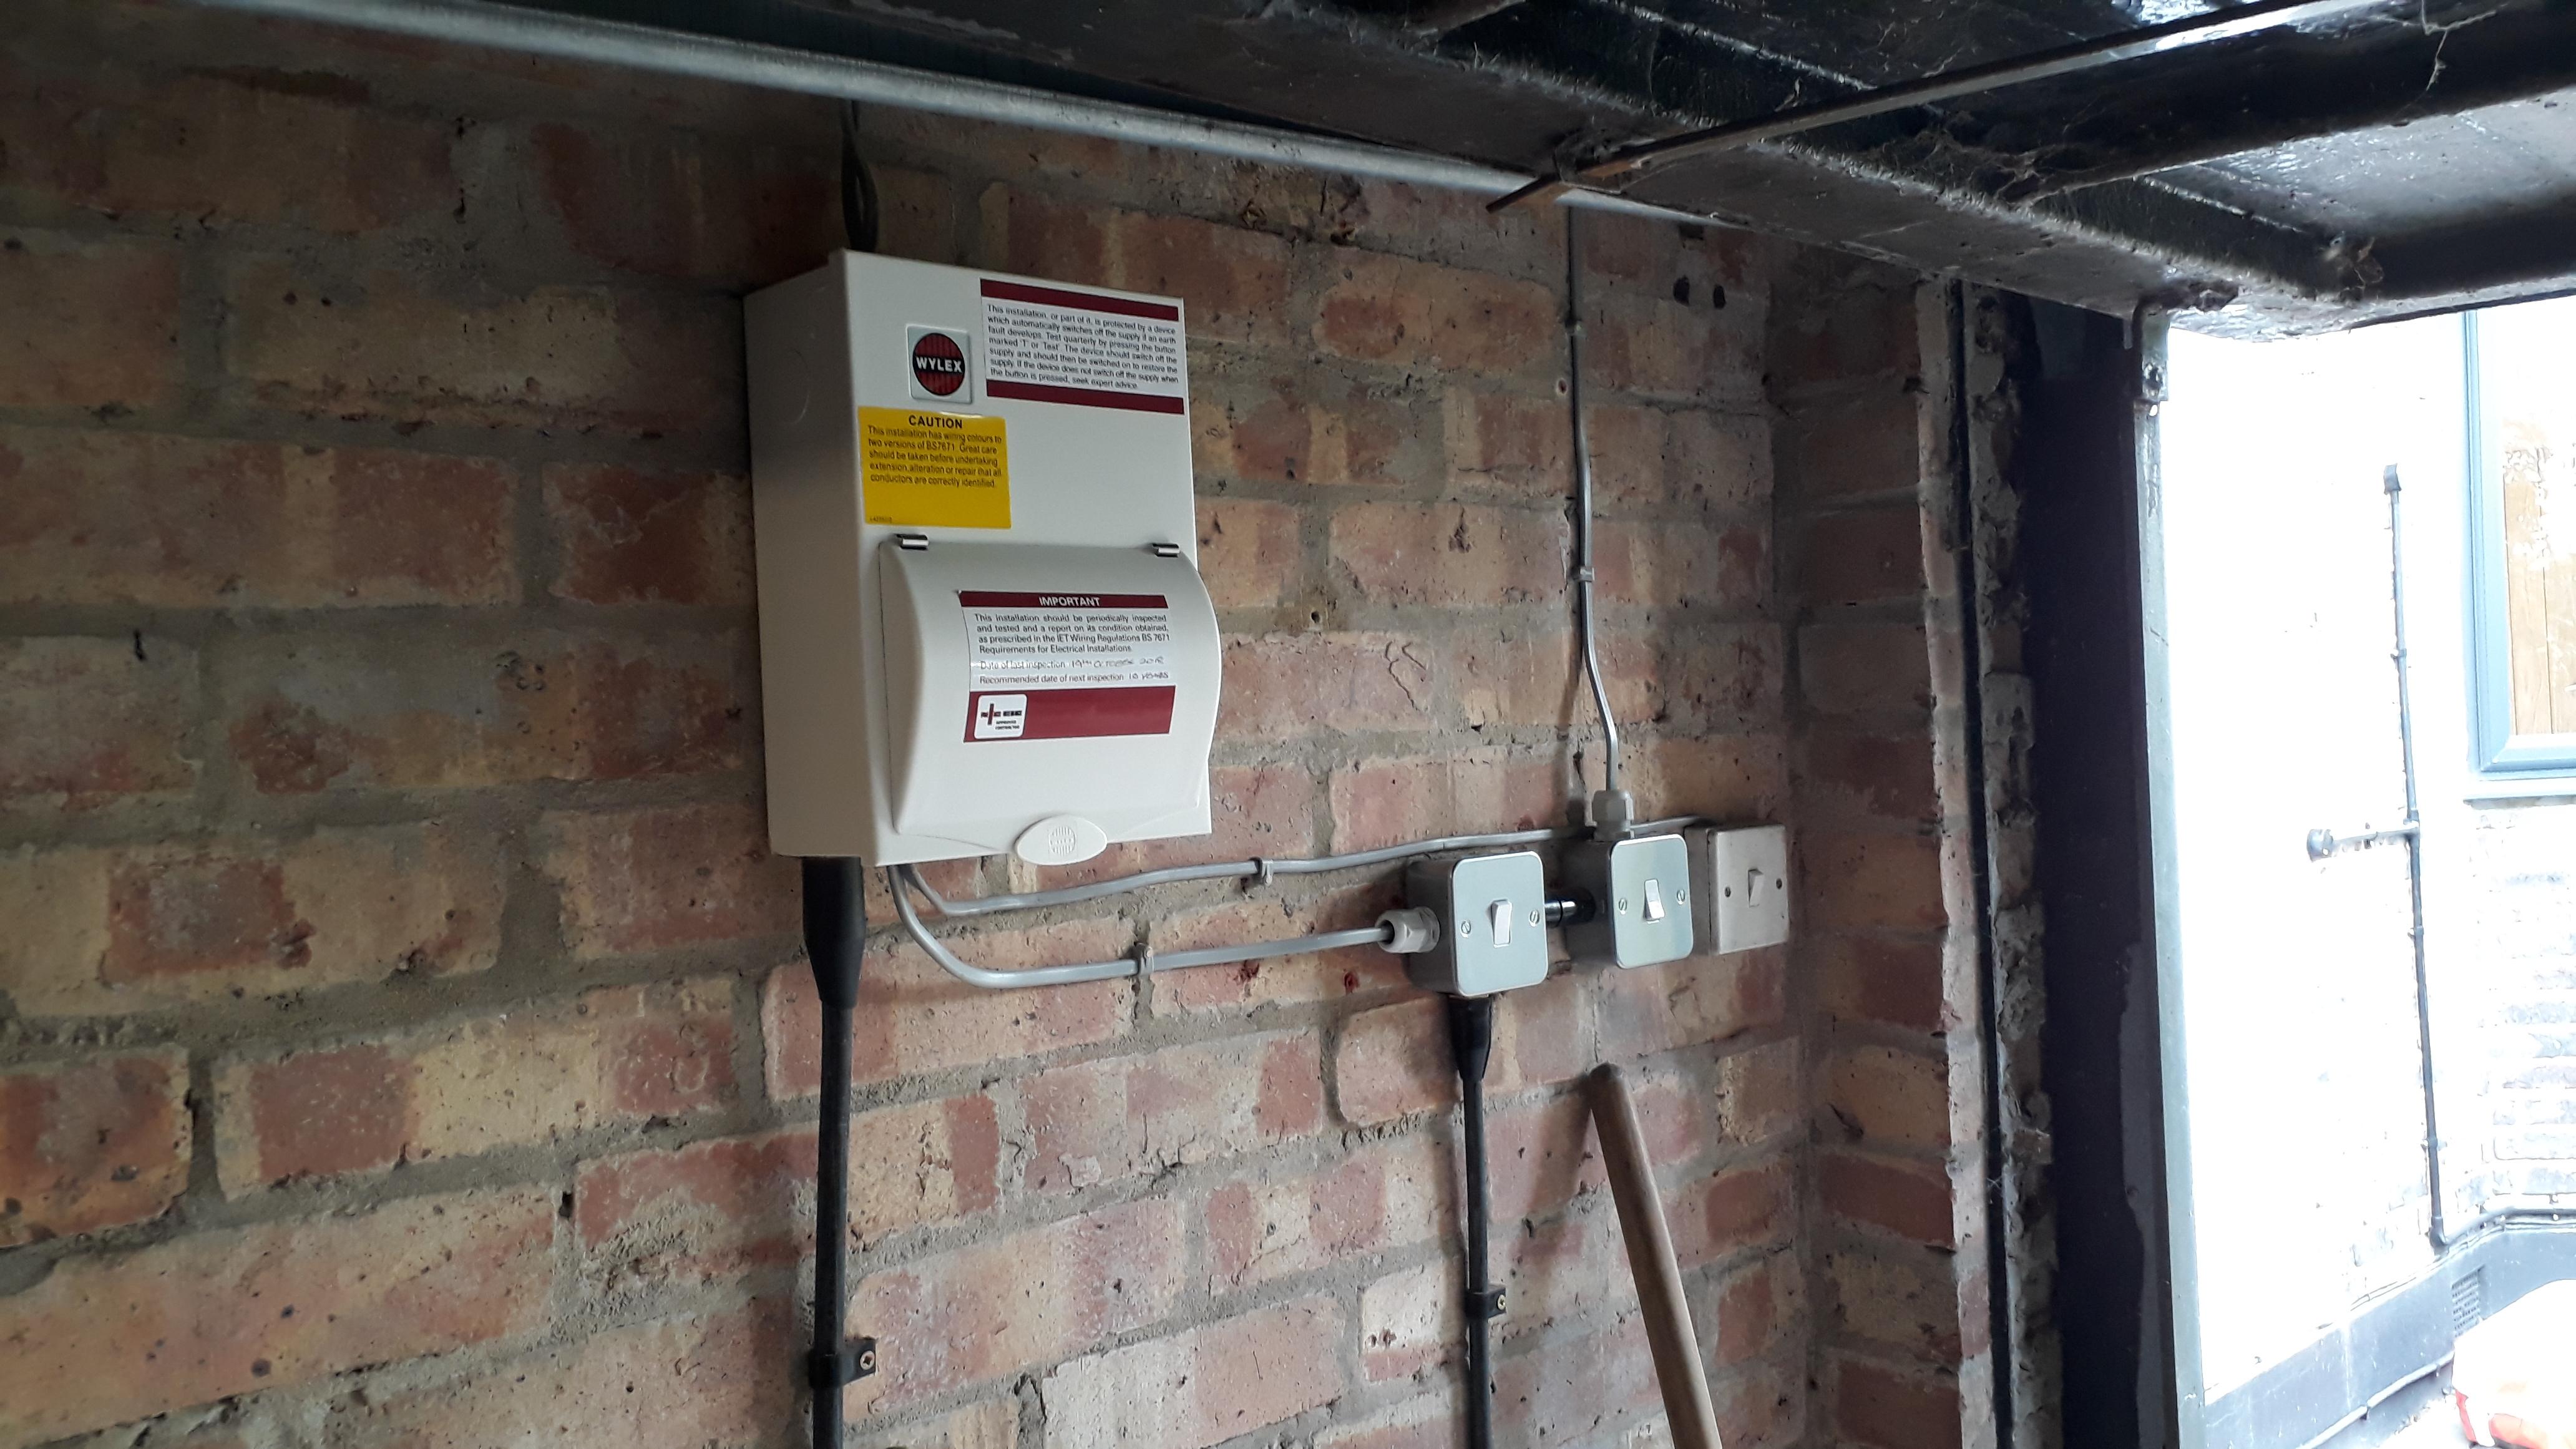 Electrical Installation Services Wiring Regulations Cooker Switch Garage Ccu